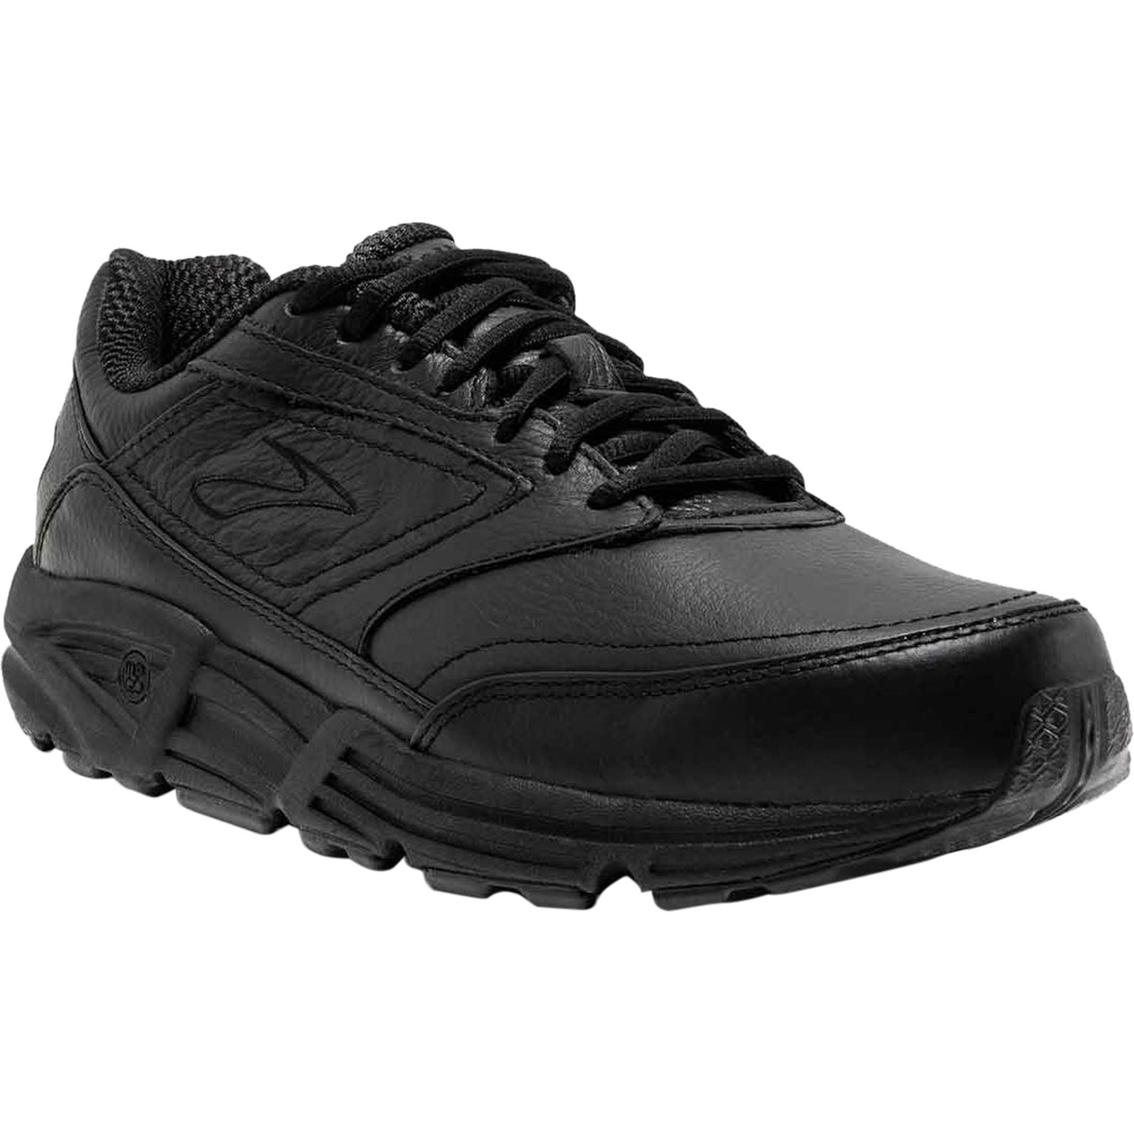 e79fe2725fb Brooks Men s Addiction Walker Shoes